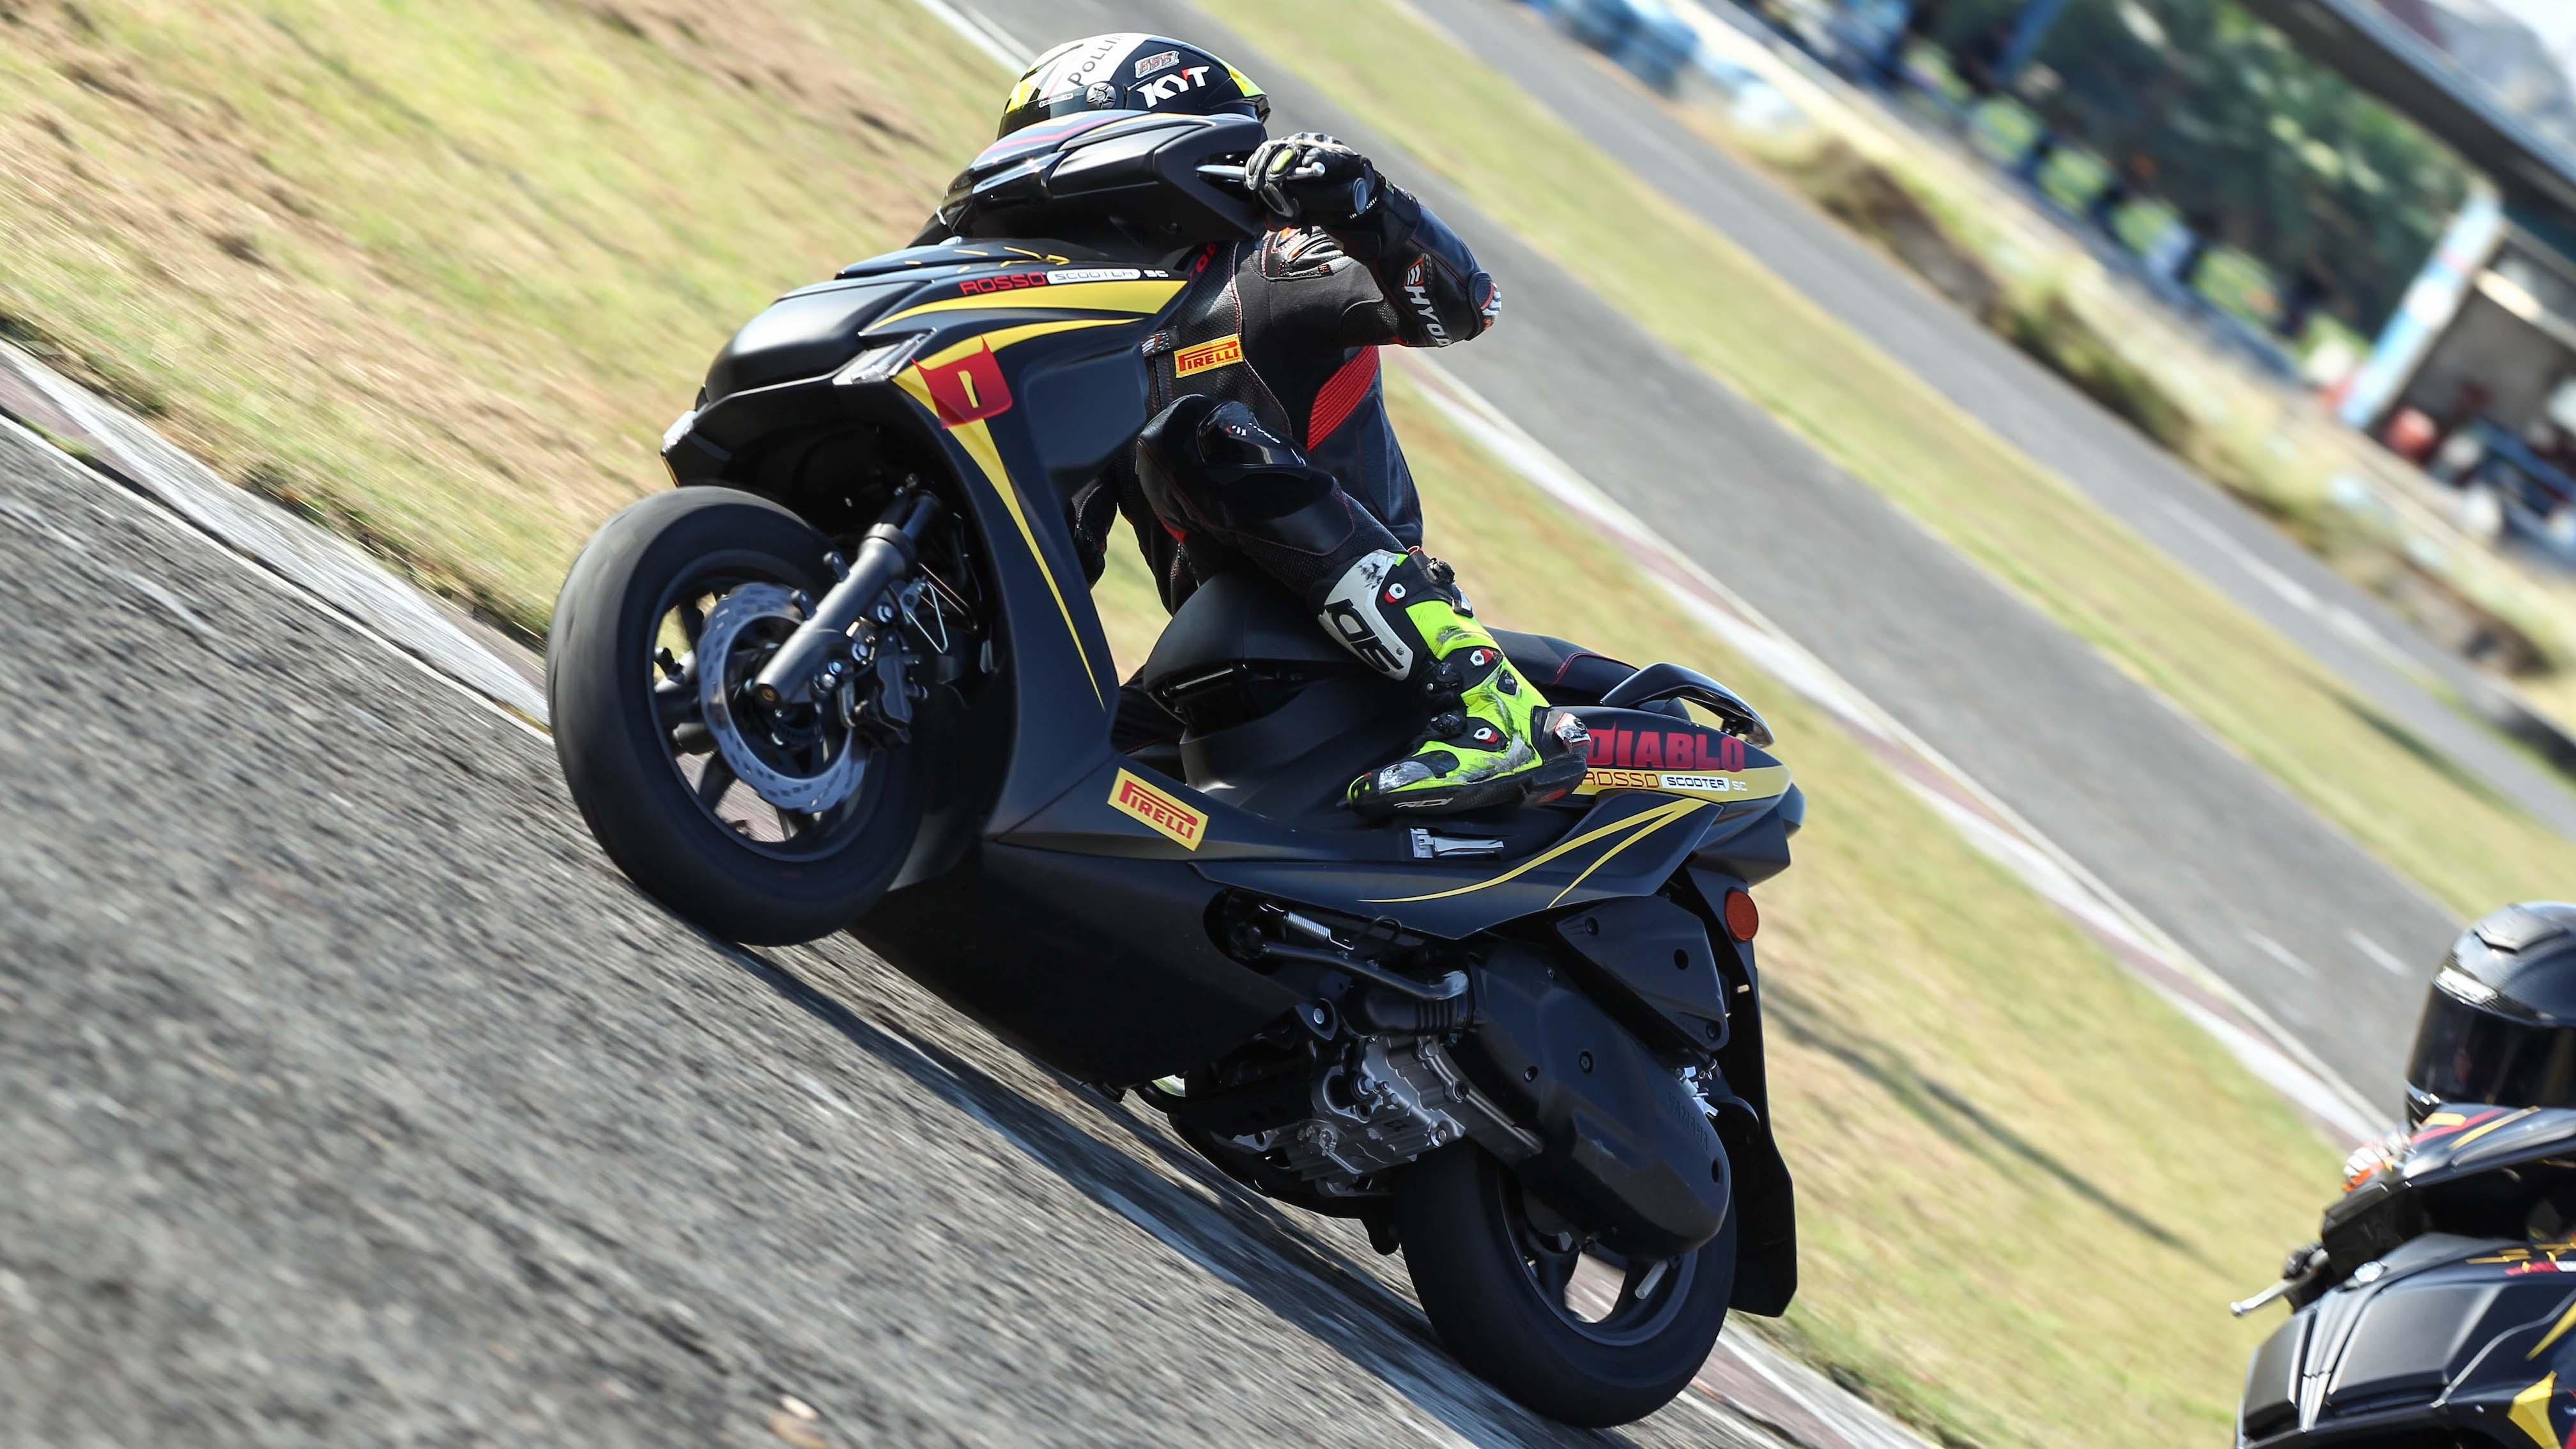 Pirelli 發表速克達競賽專用胎 Diablo Rosso™ Scooter SC